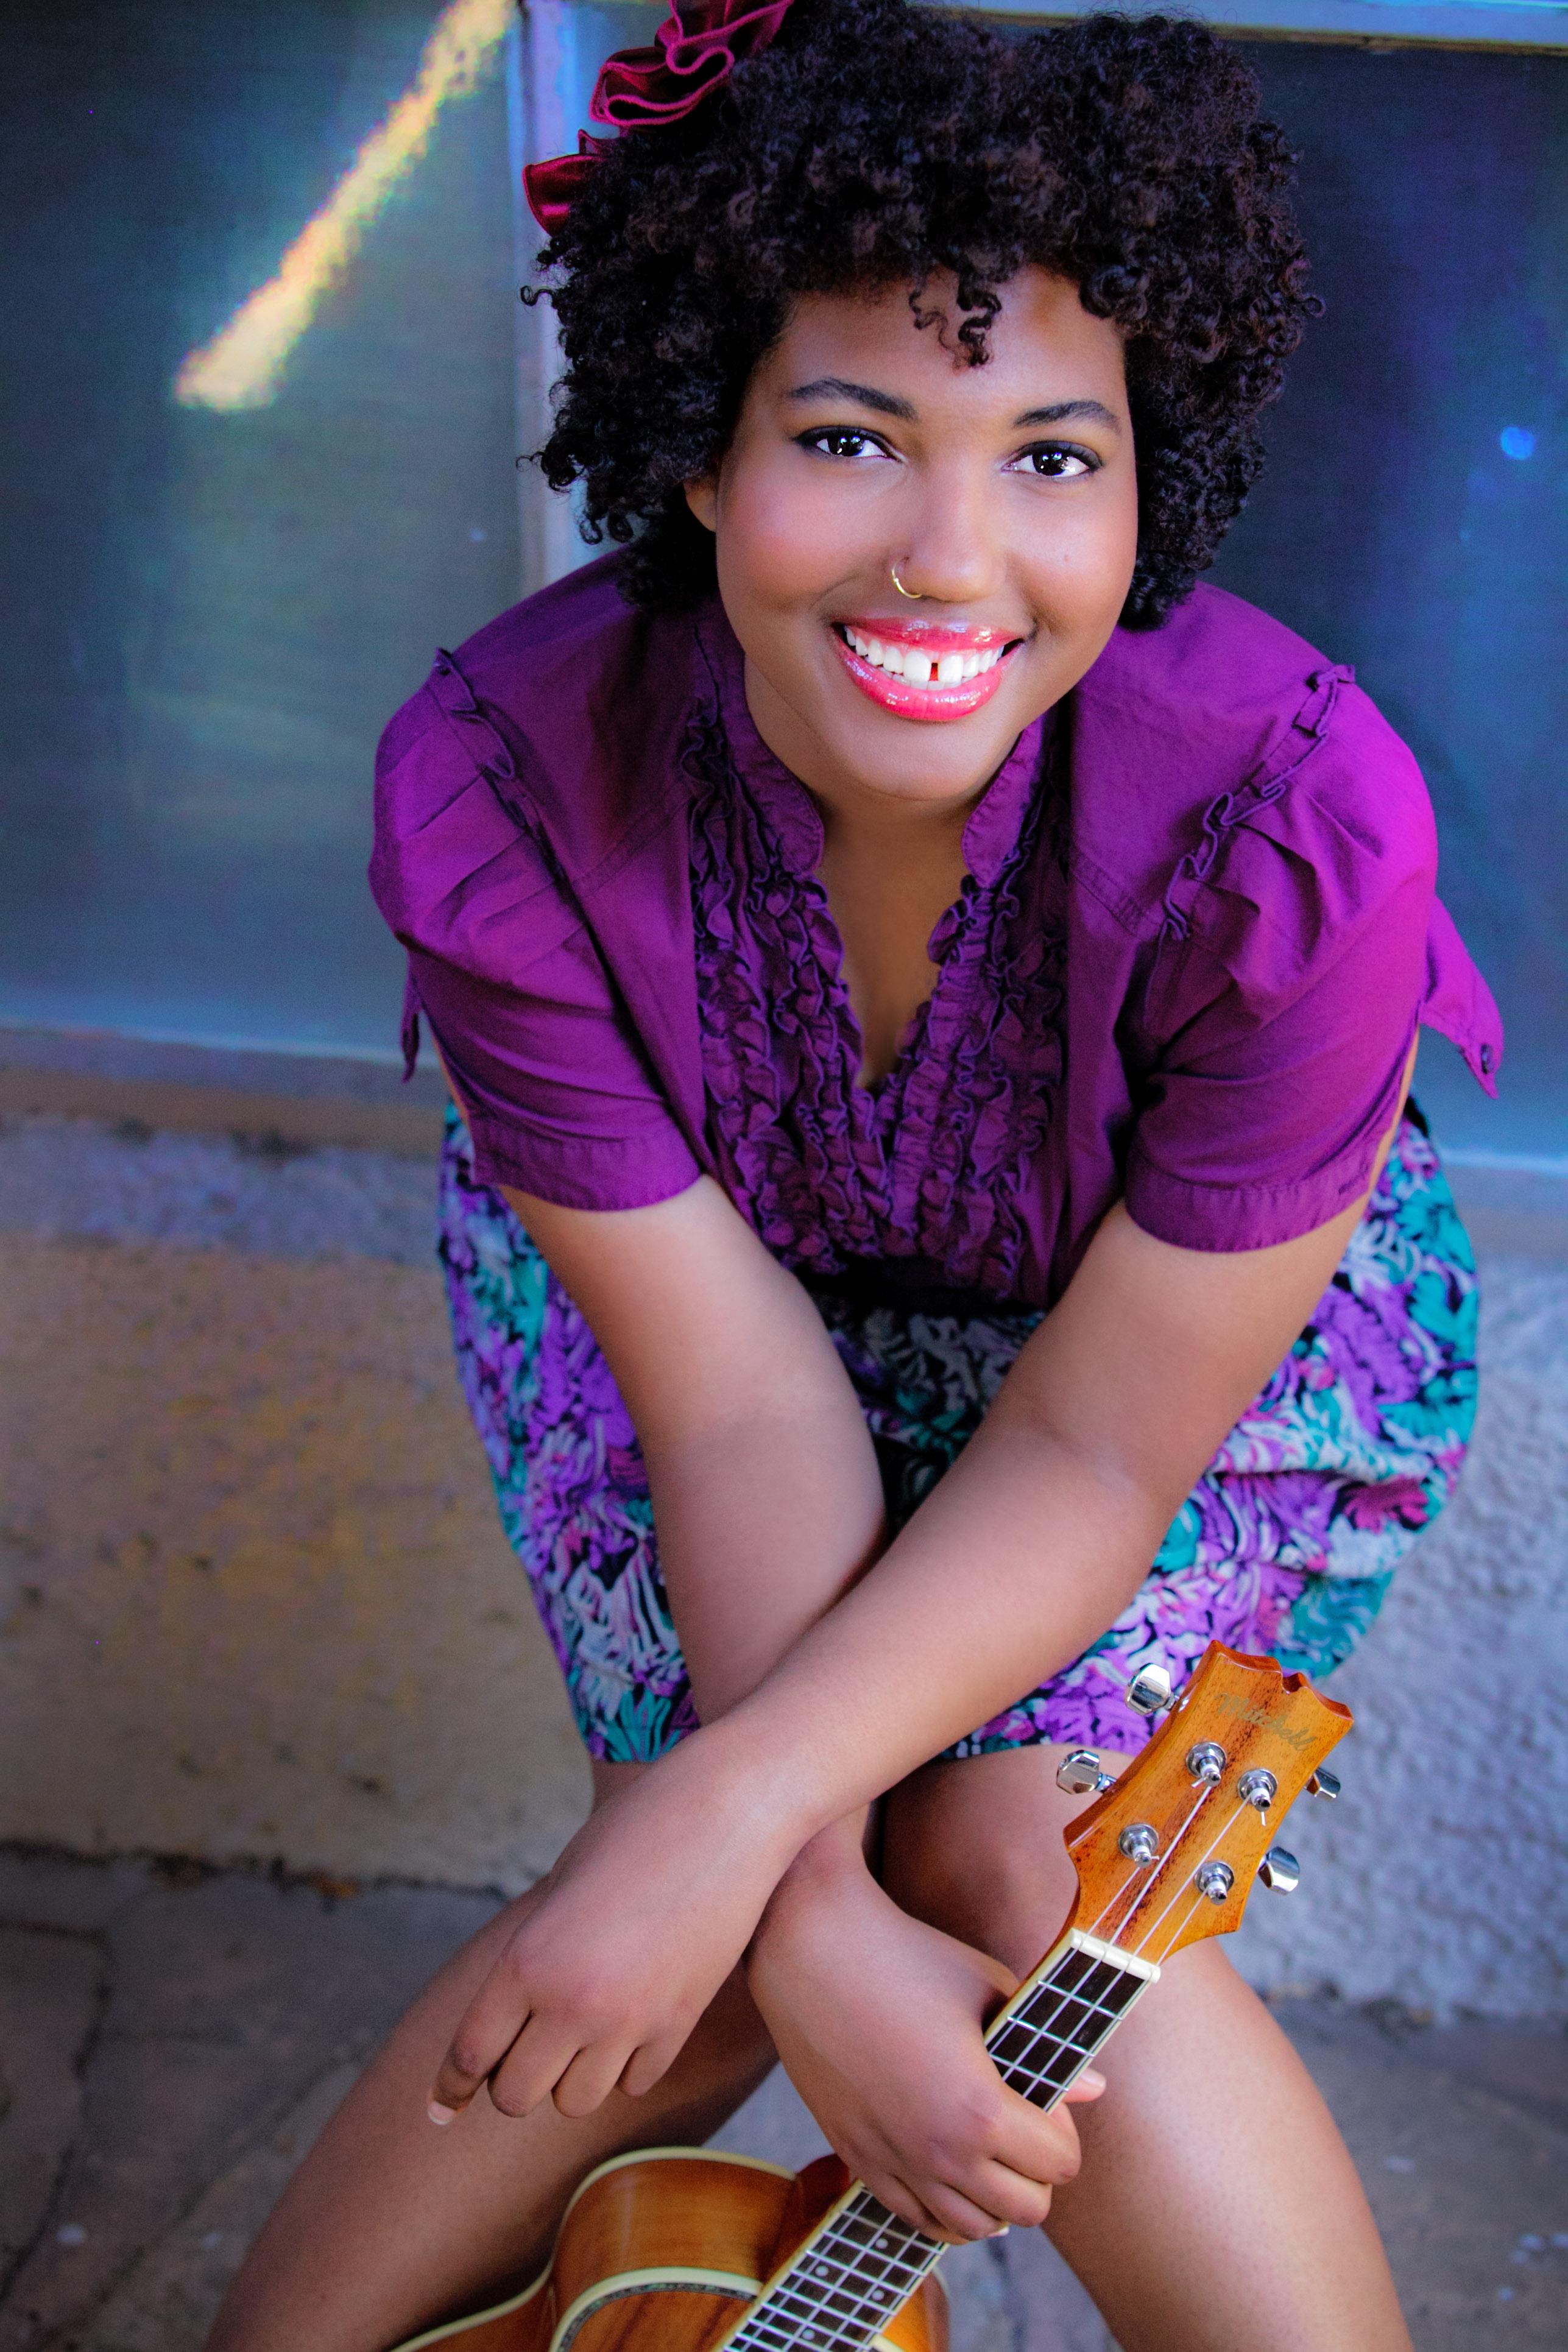 Musician Lexee Harris